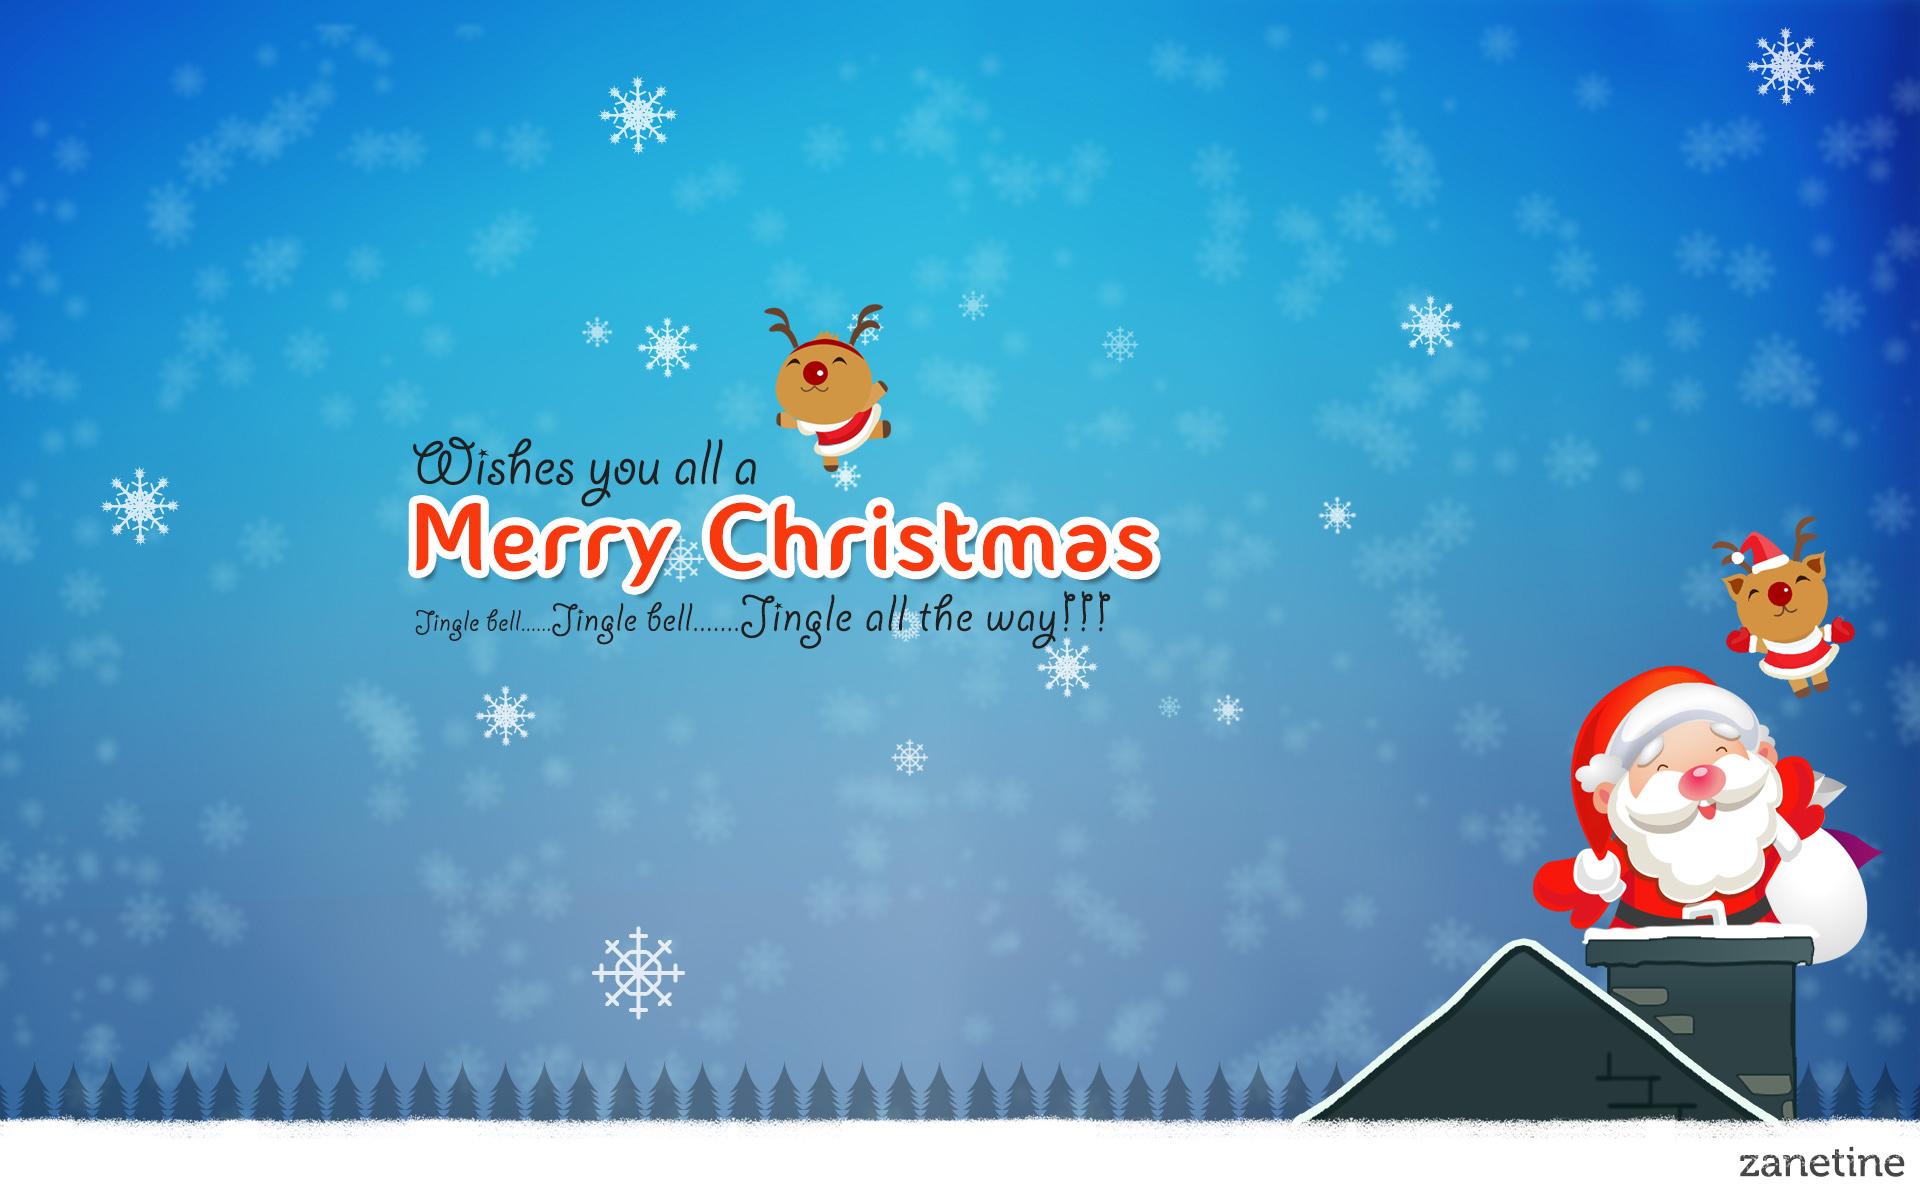 merry christmas jingle bells wallpapers   hd wallpapers